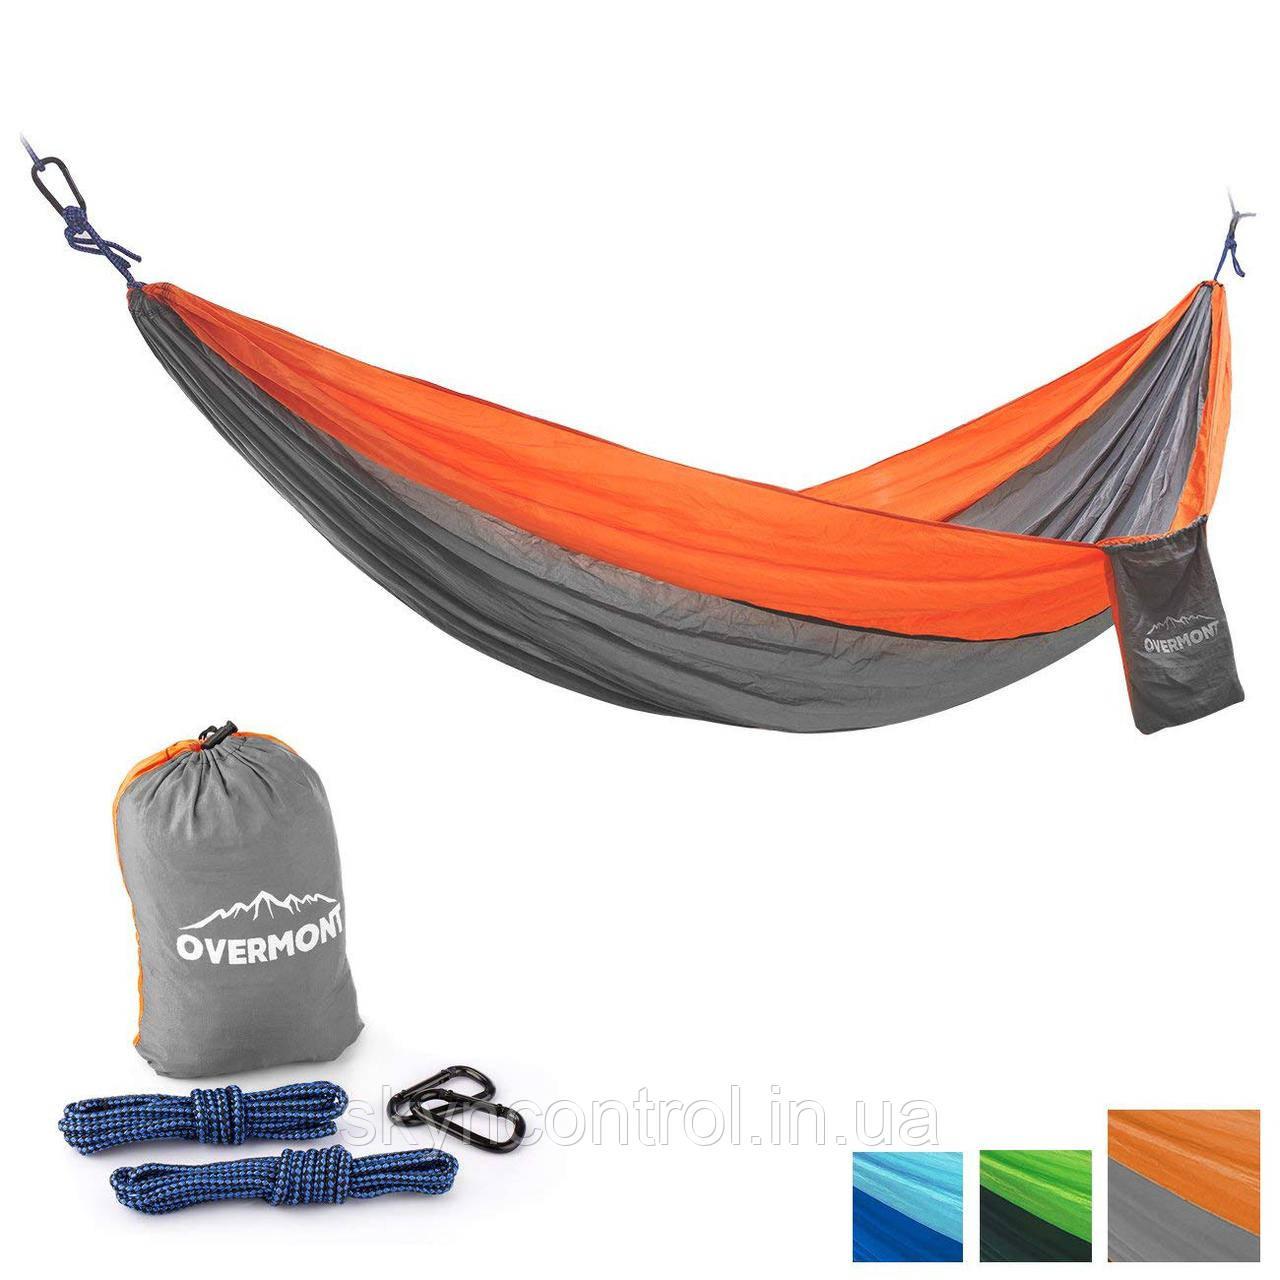 Overmont Portable Double 2 Person Orange + Grey Гамак Парашют для кемпинга Пешеходный туризм 118.1x78.7